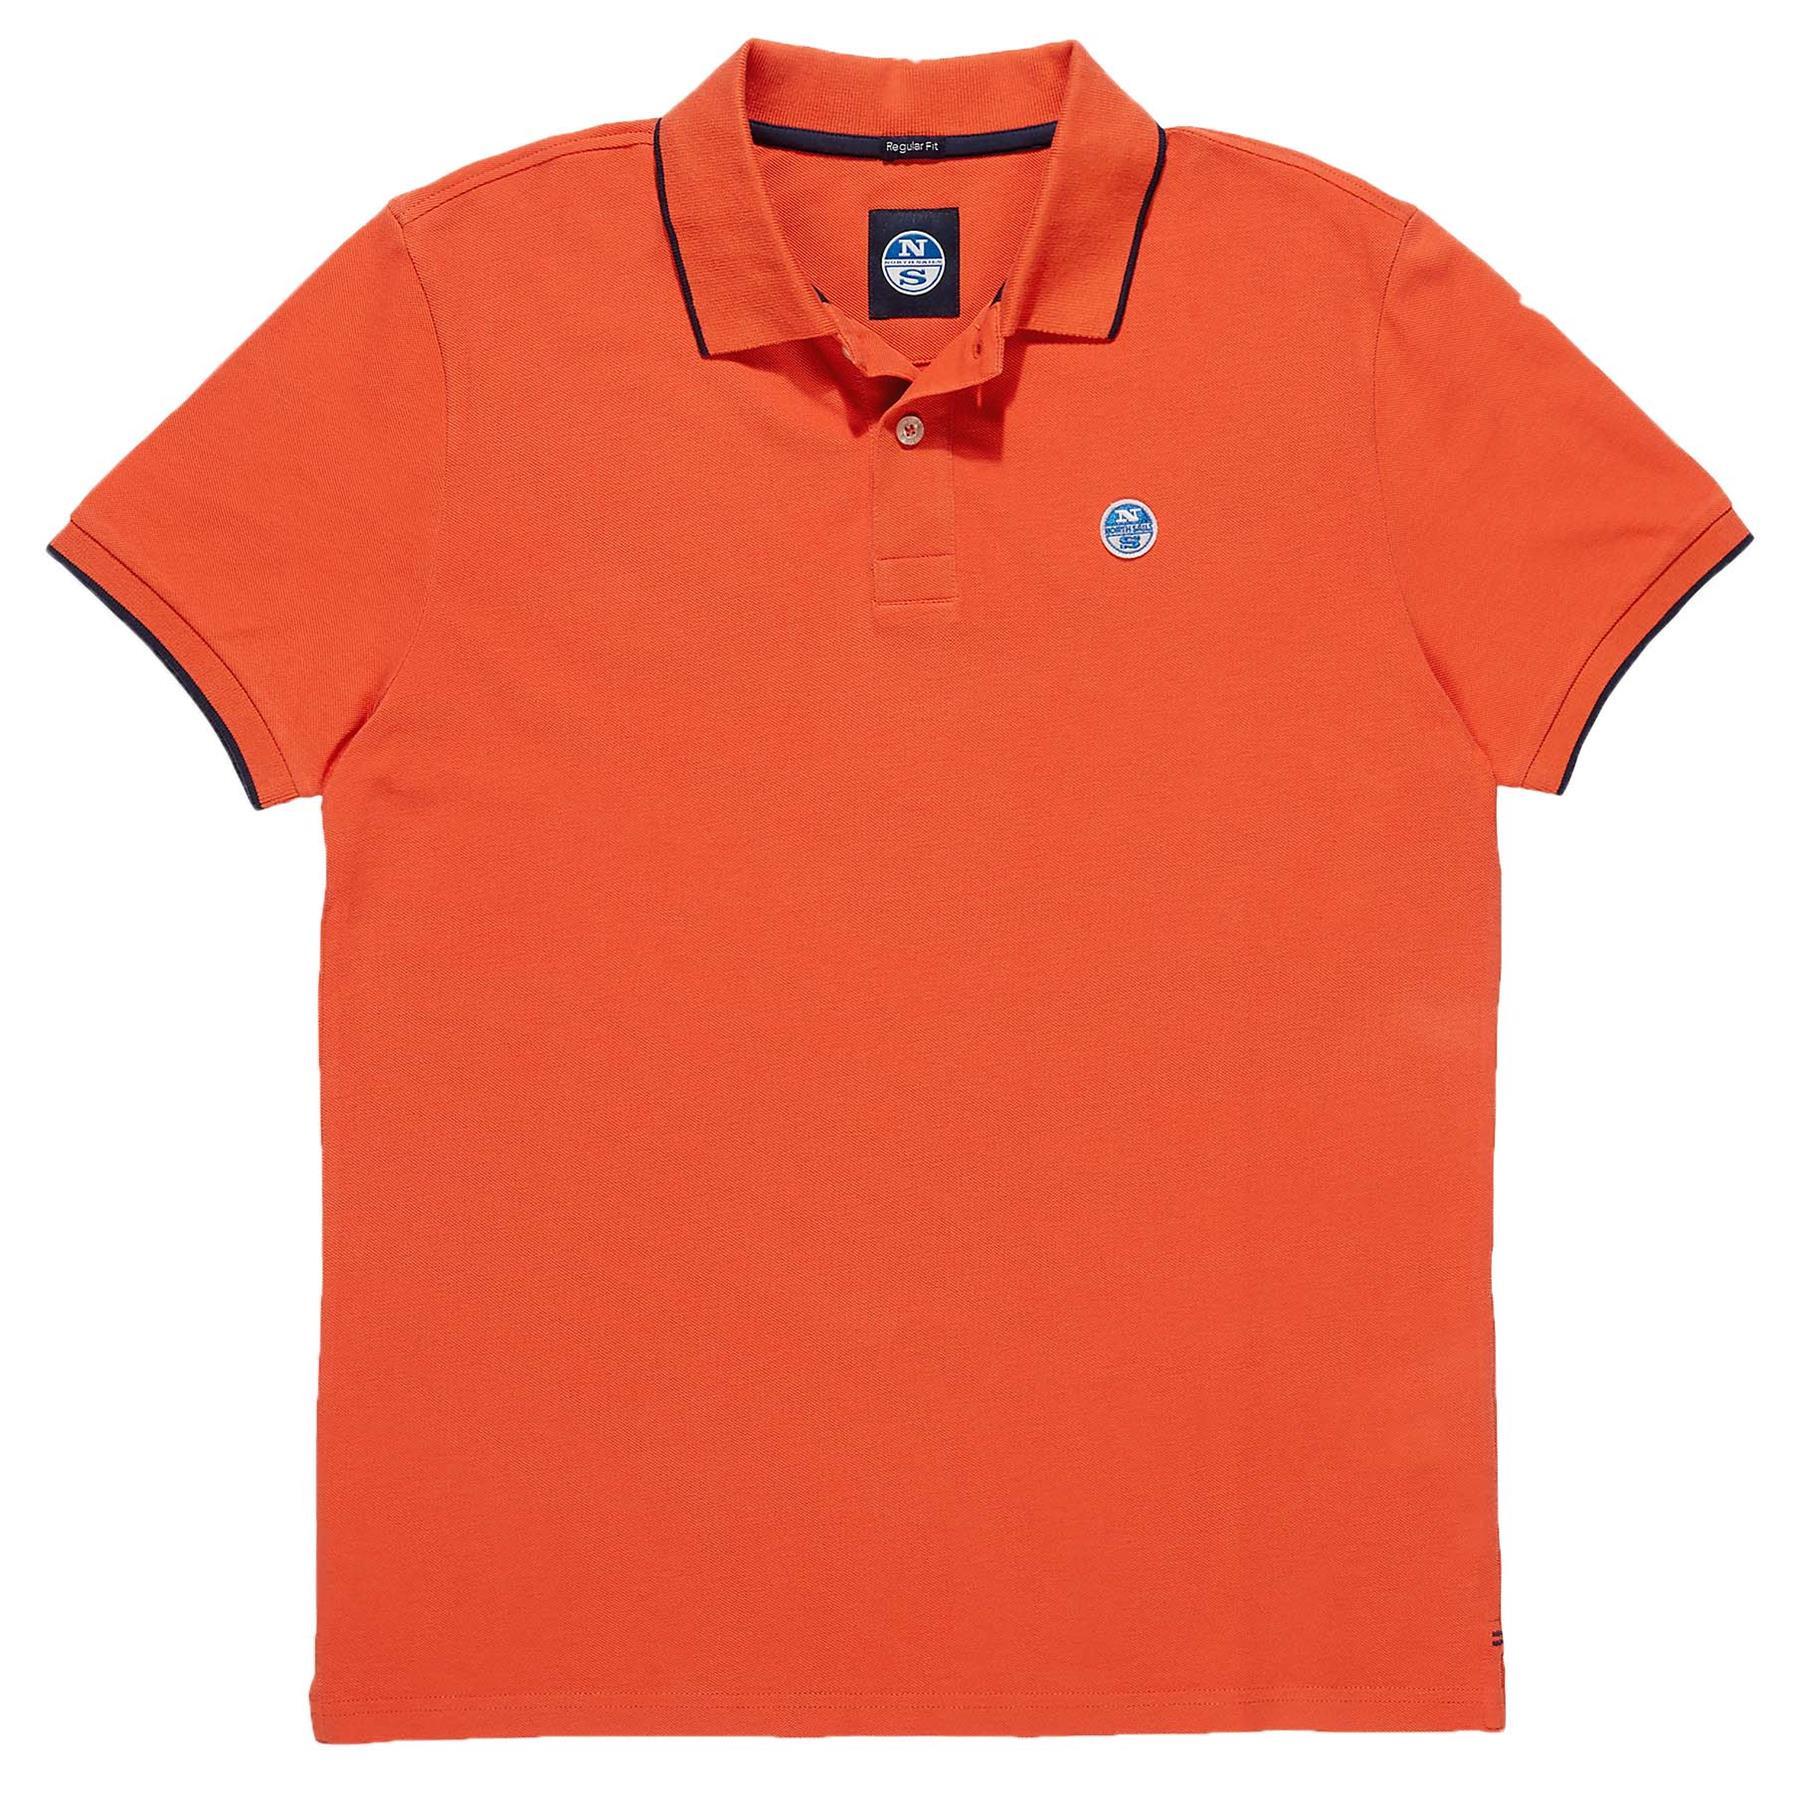 NORTH-SAILS-Mens-Legacy-Heritage-Short-Sleeve-Polo-Shirt-SALE-RRP-50 thumbnail 37